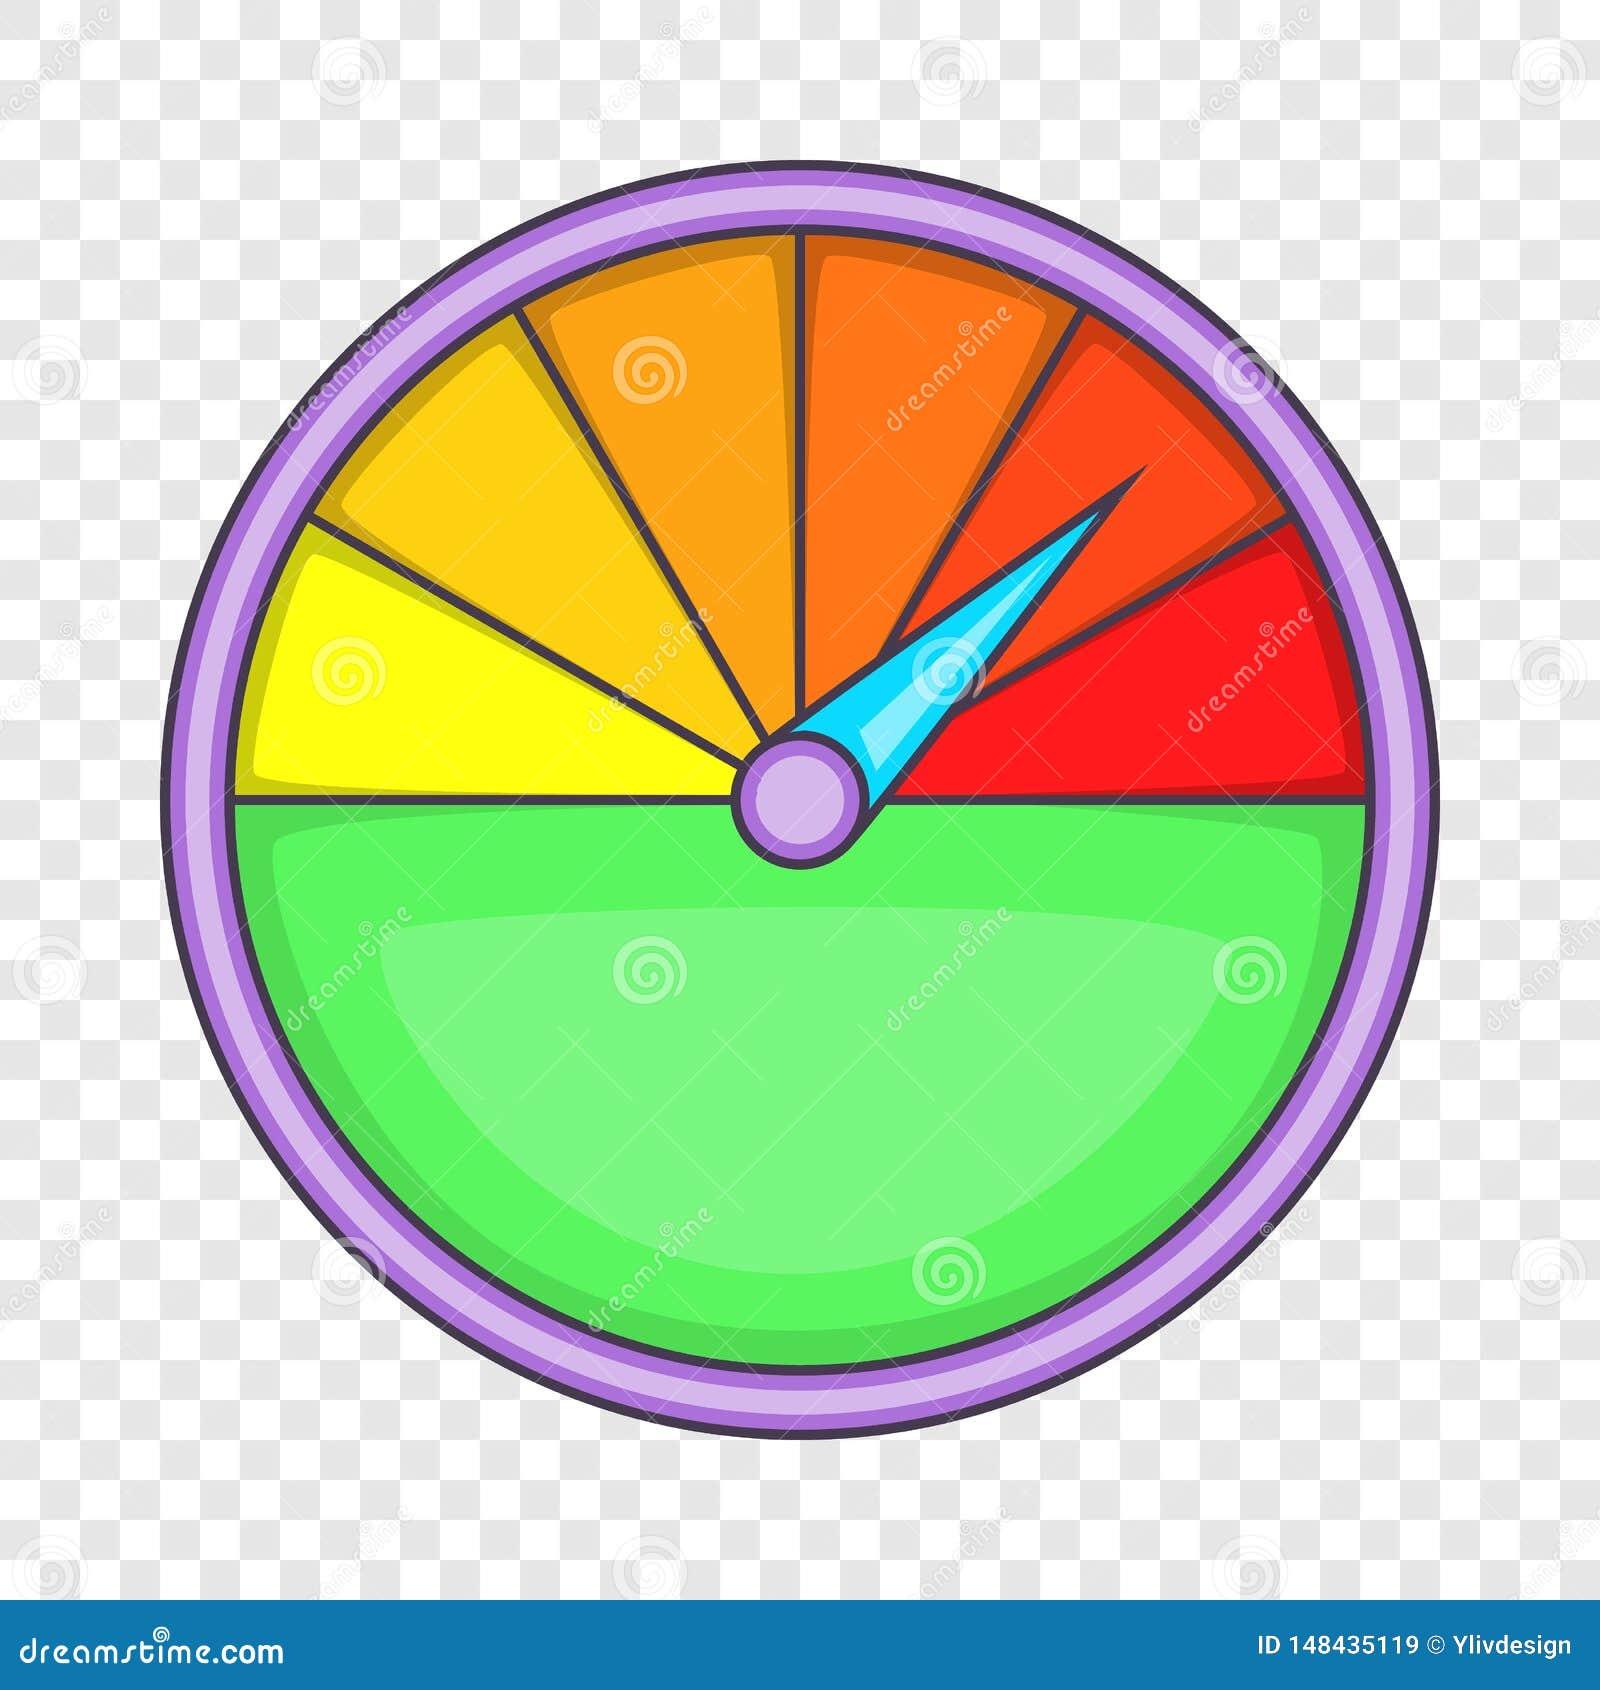 Colorful Speedometer Icon, Cartoon Style Stock Vector